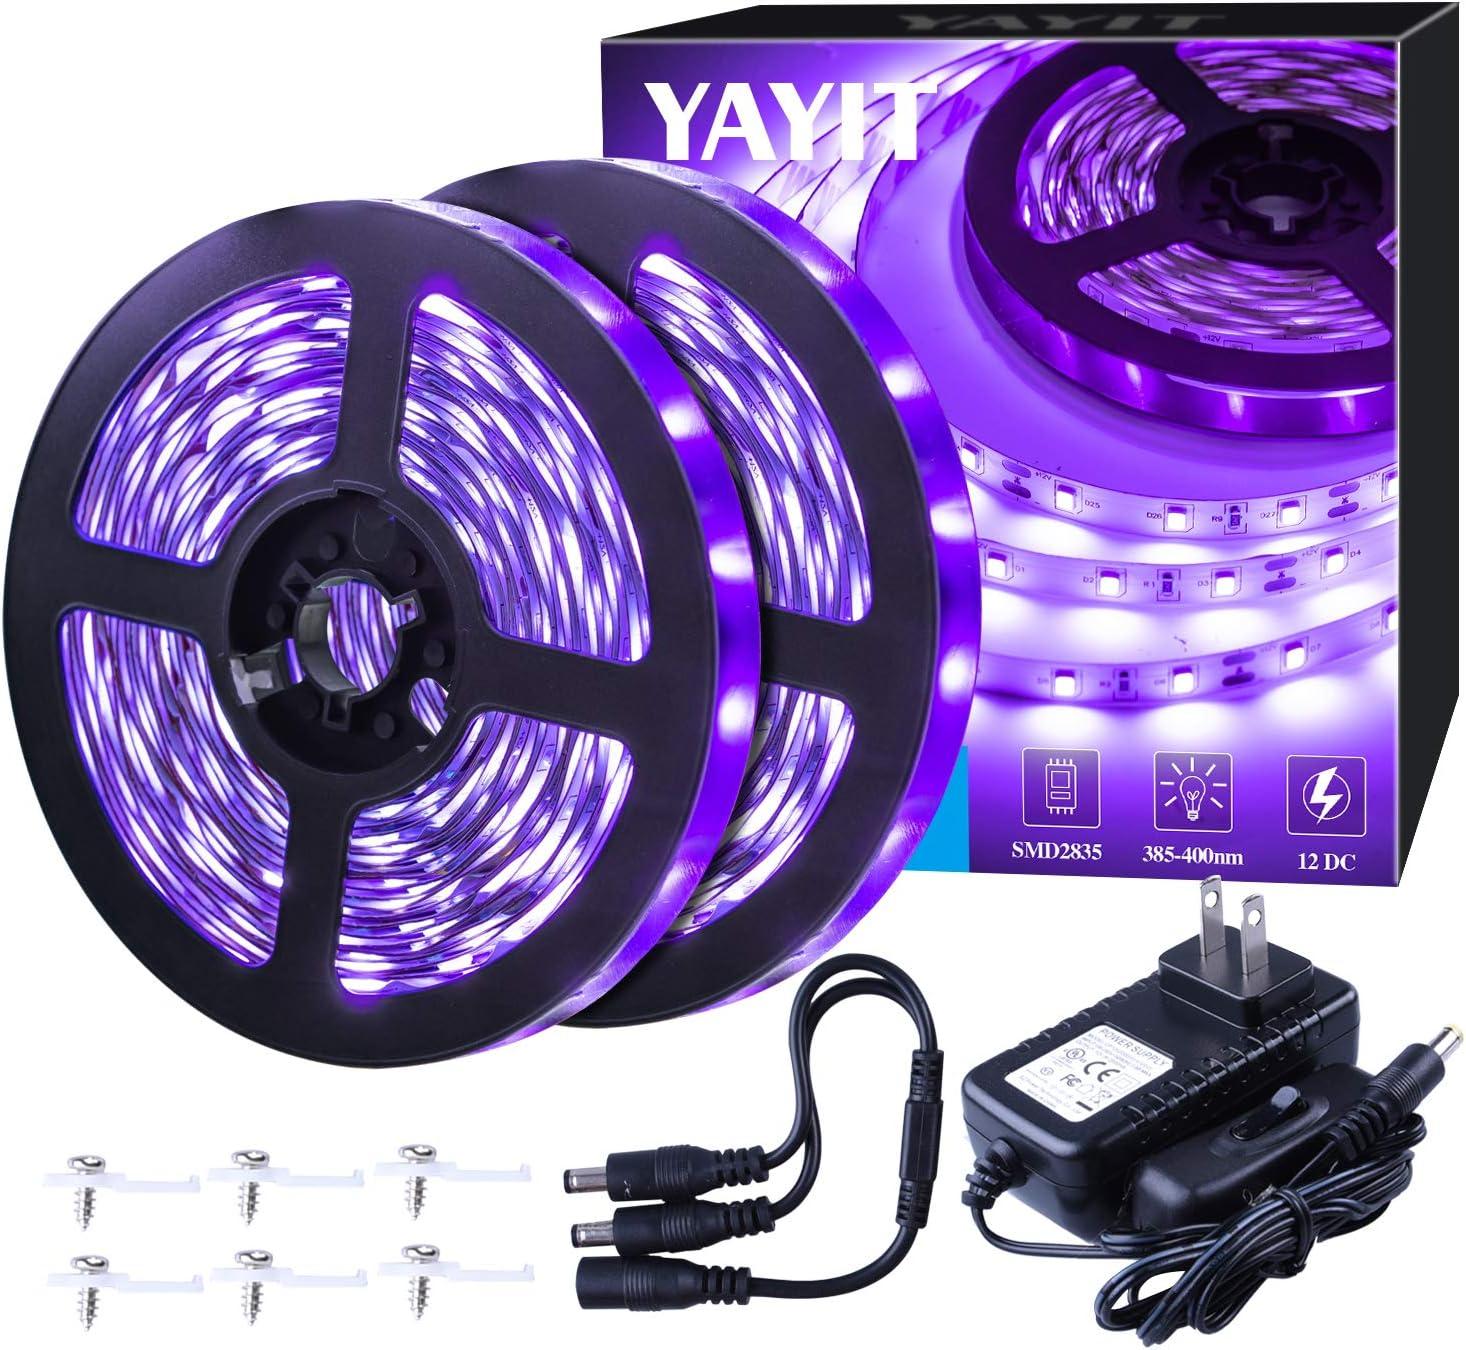 YAYIT 40 Foot Led Black Light Strip Kit, 720 Units Led, 12V Flexible Blacklight Fixtures, Non-Waterproof